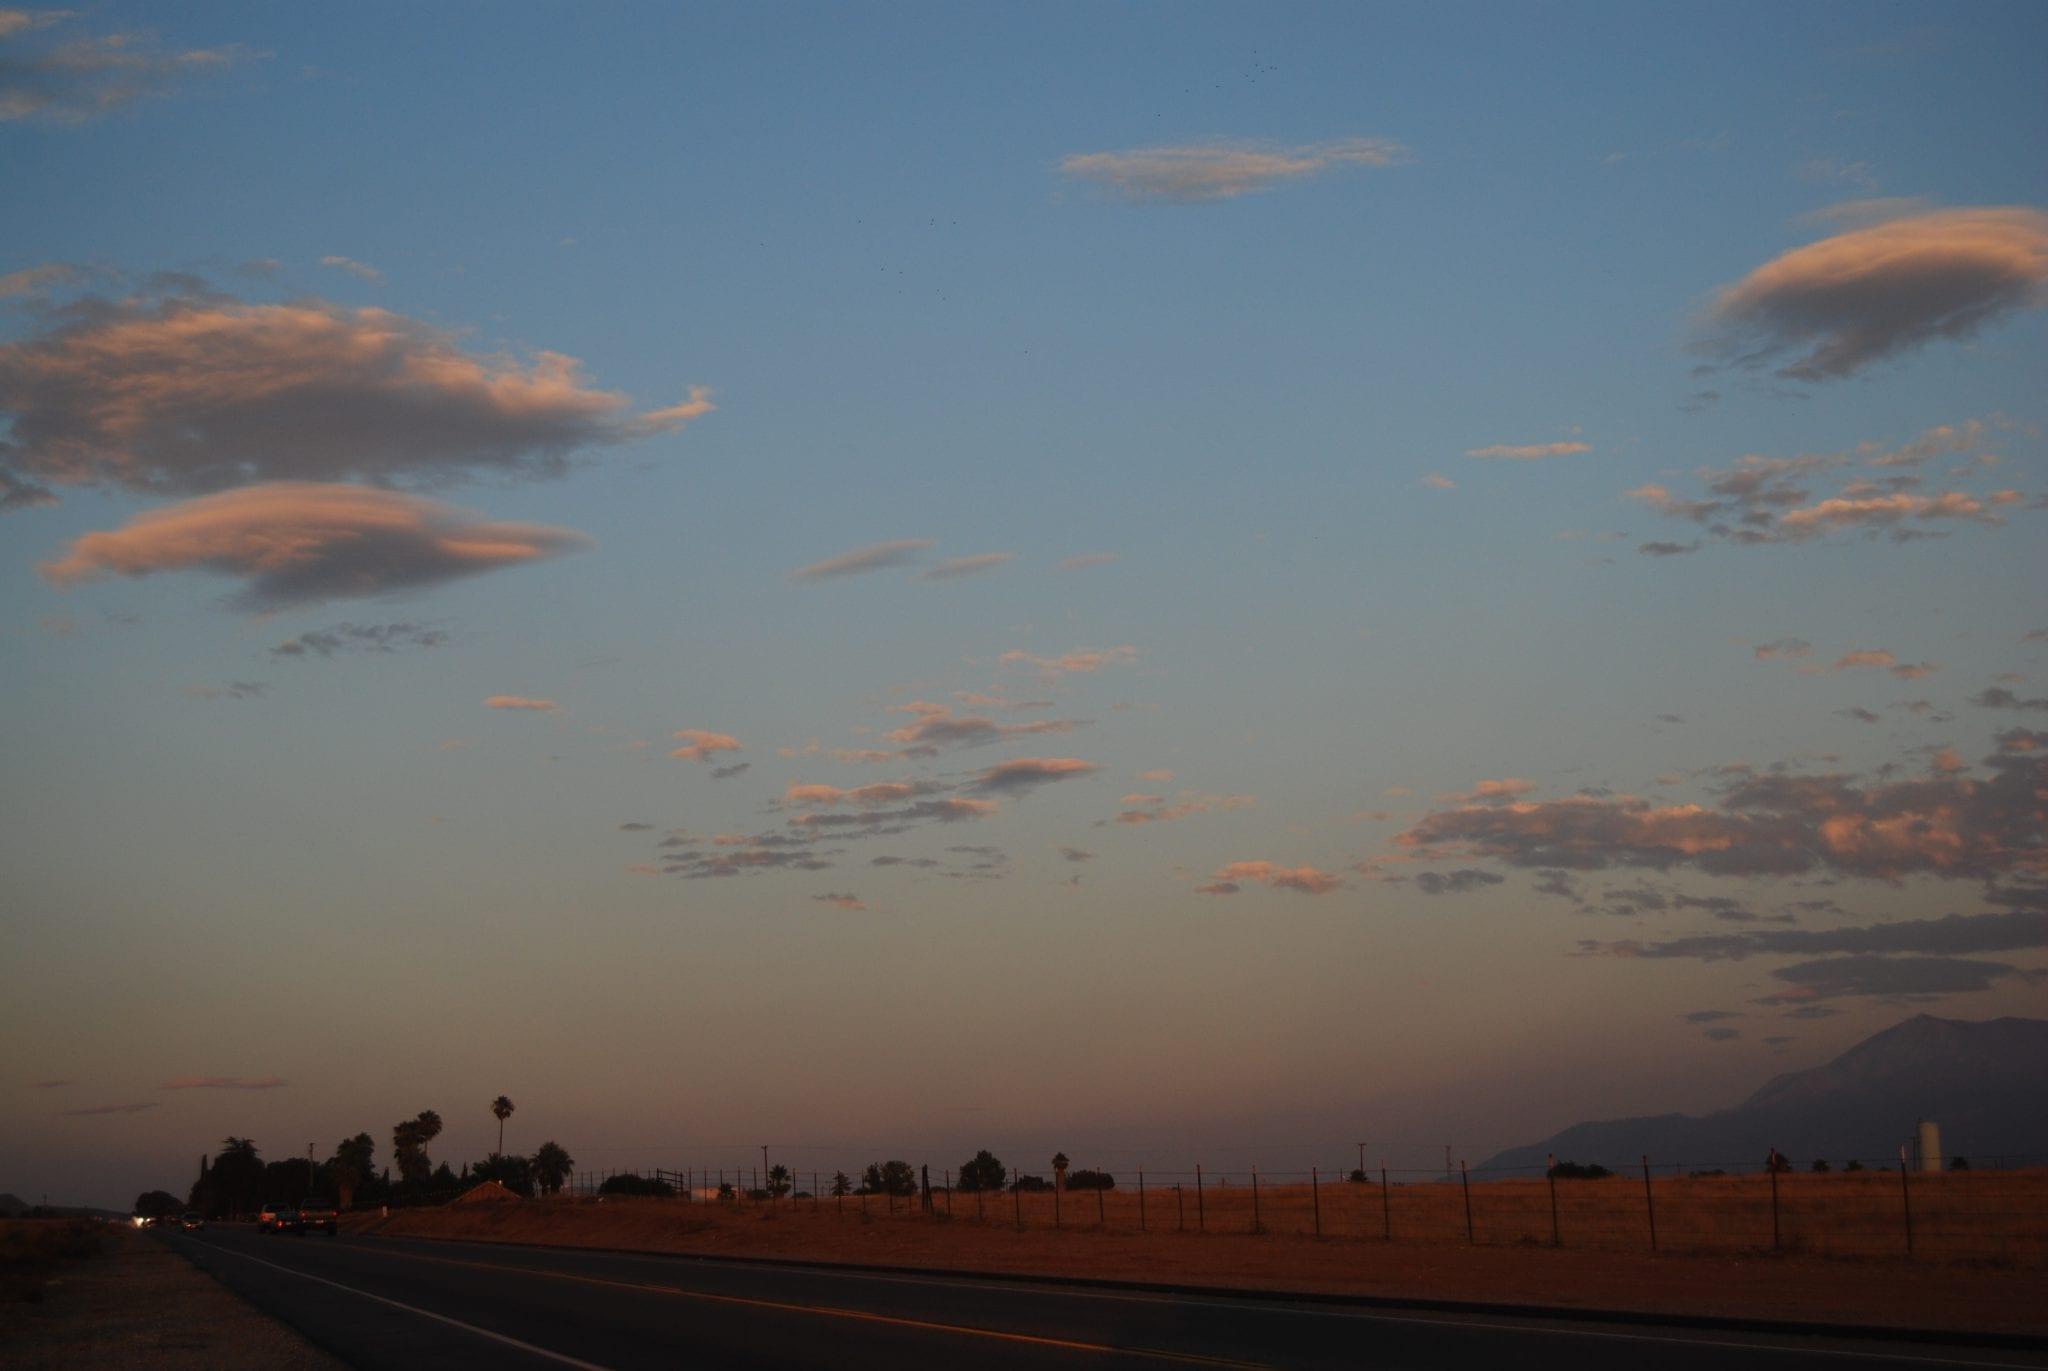 Yucaipa Apple Valley Road